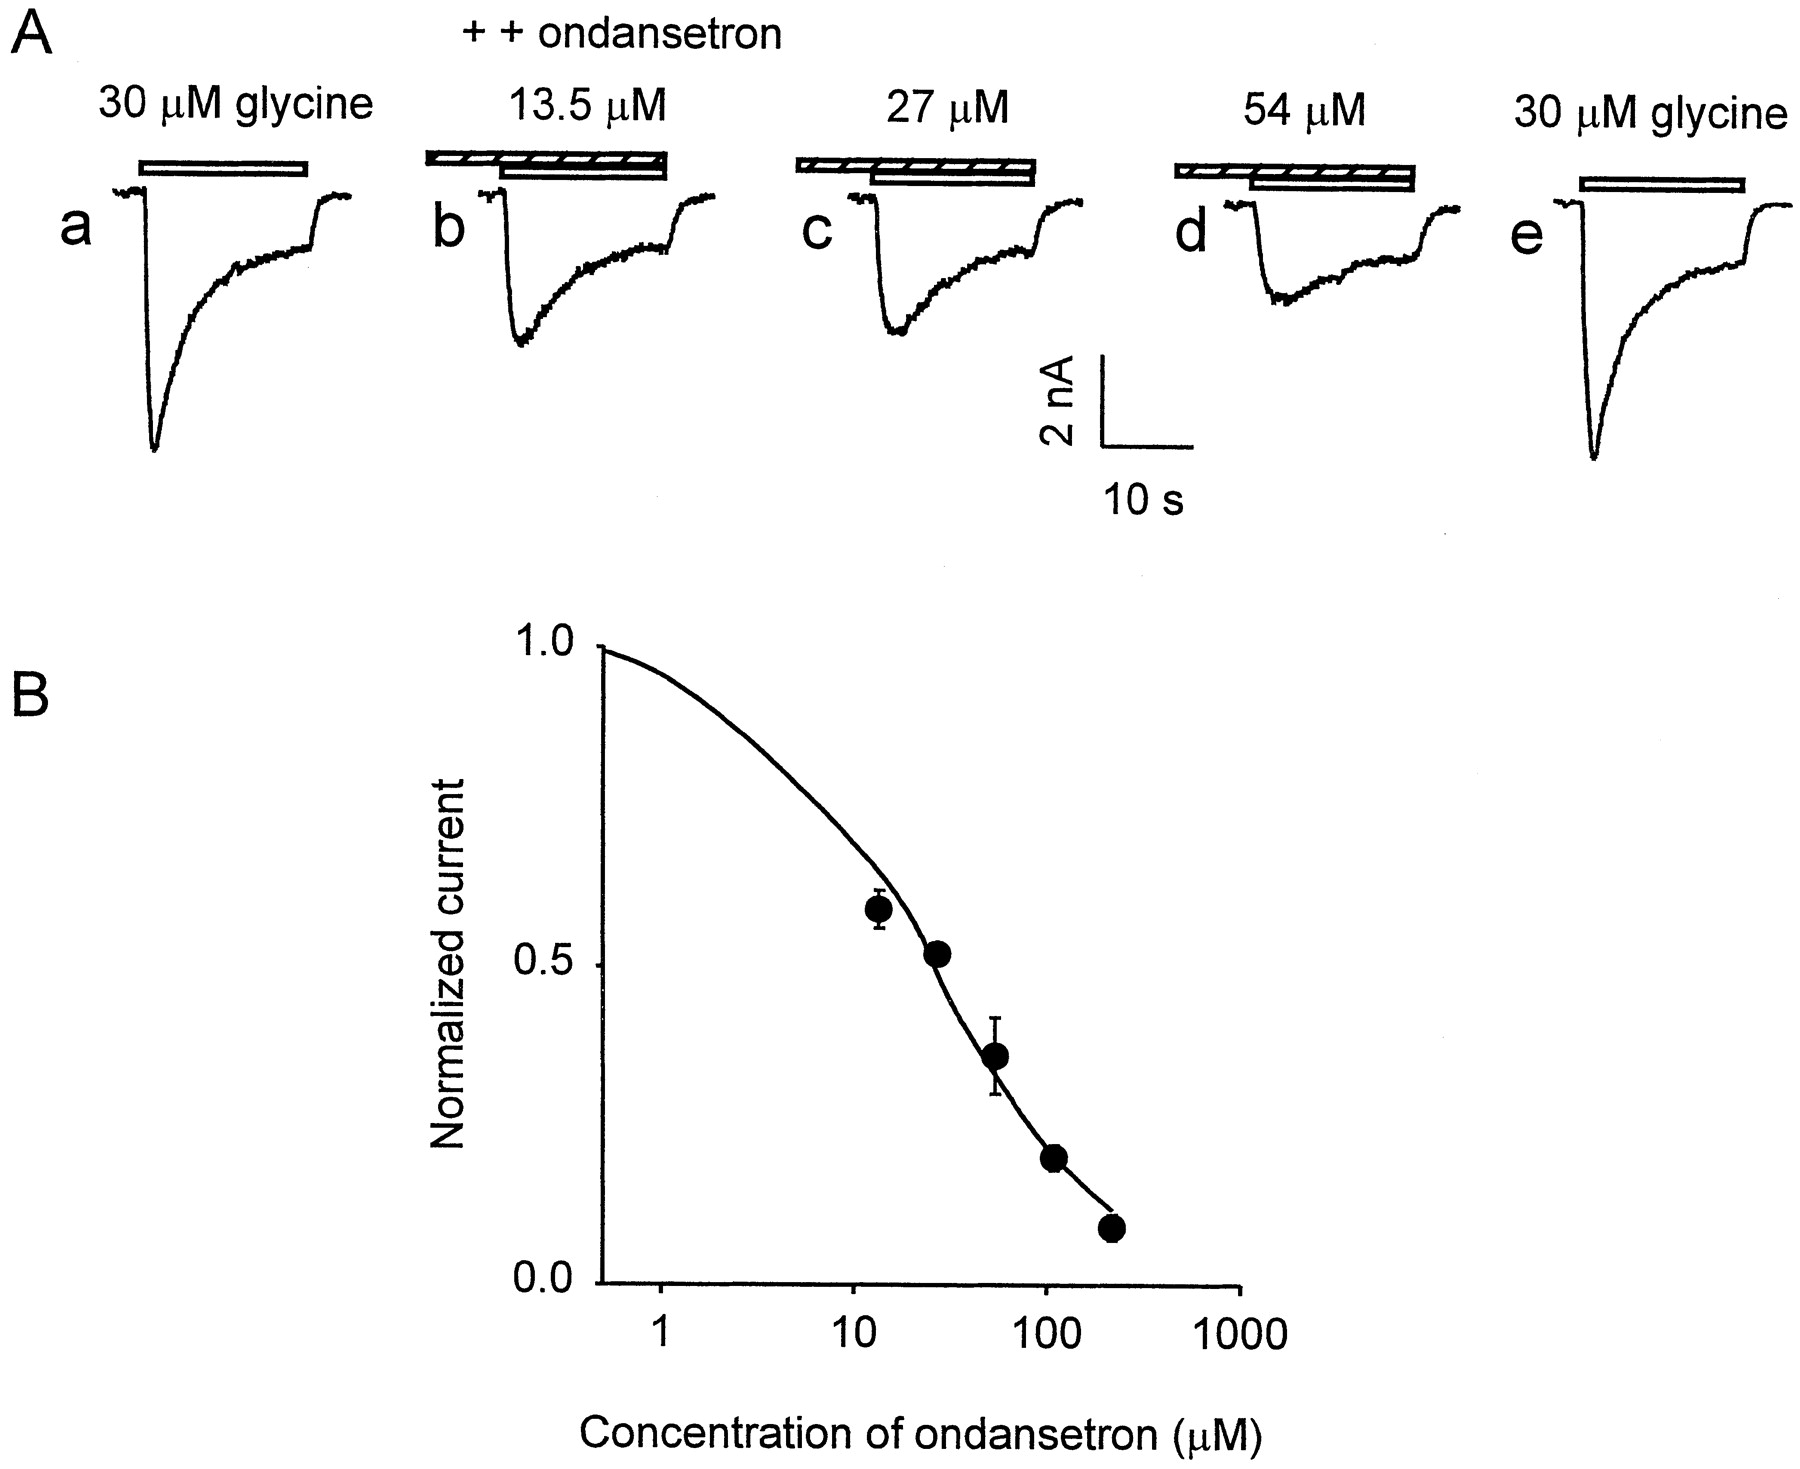 Inhibitory Effect of Ondansetron on Glycine Response of ...